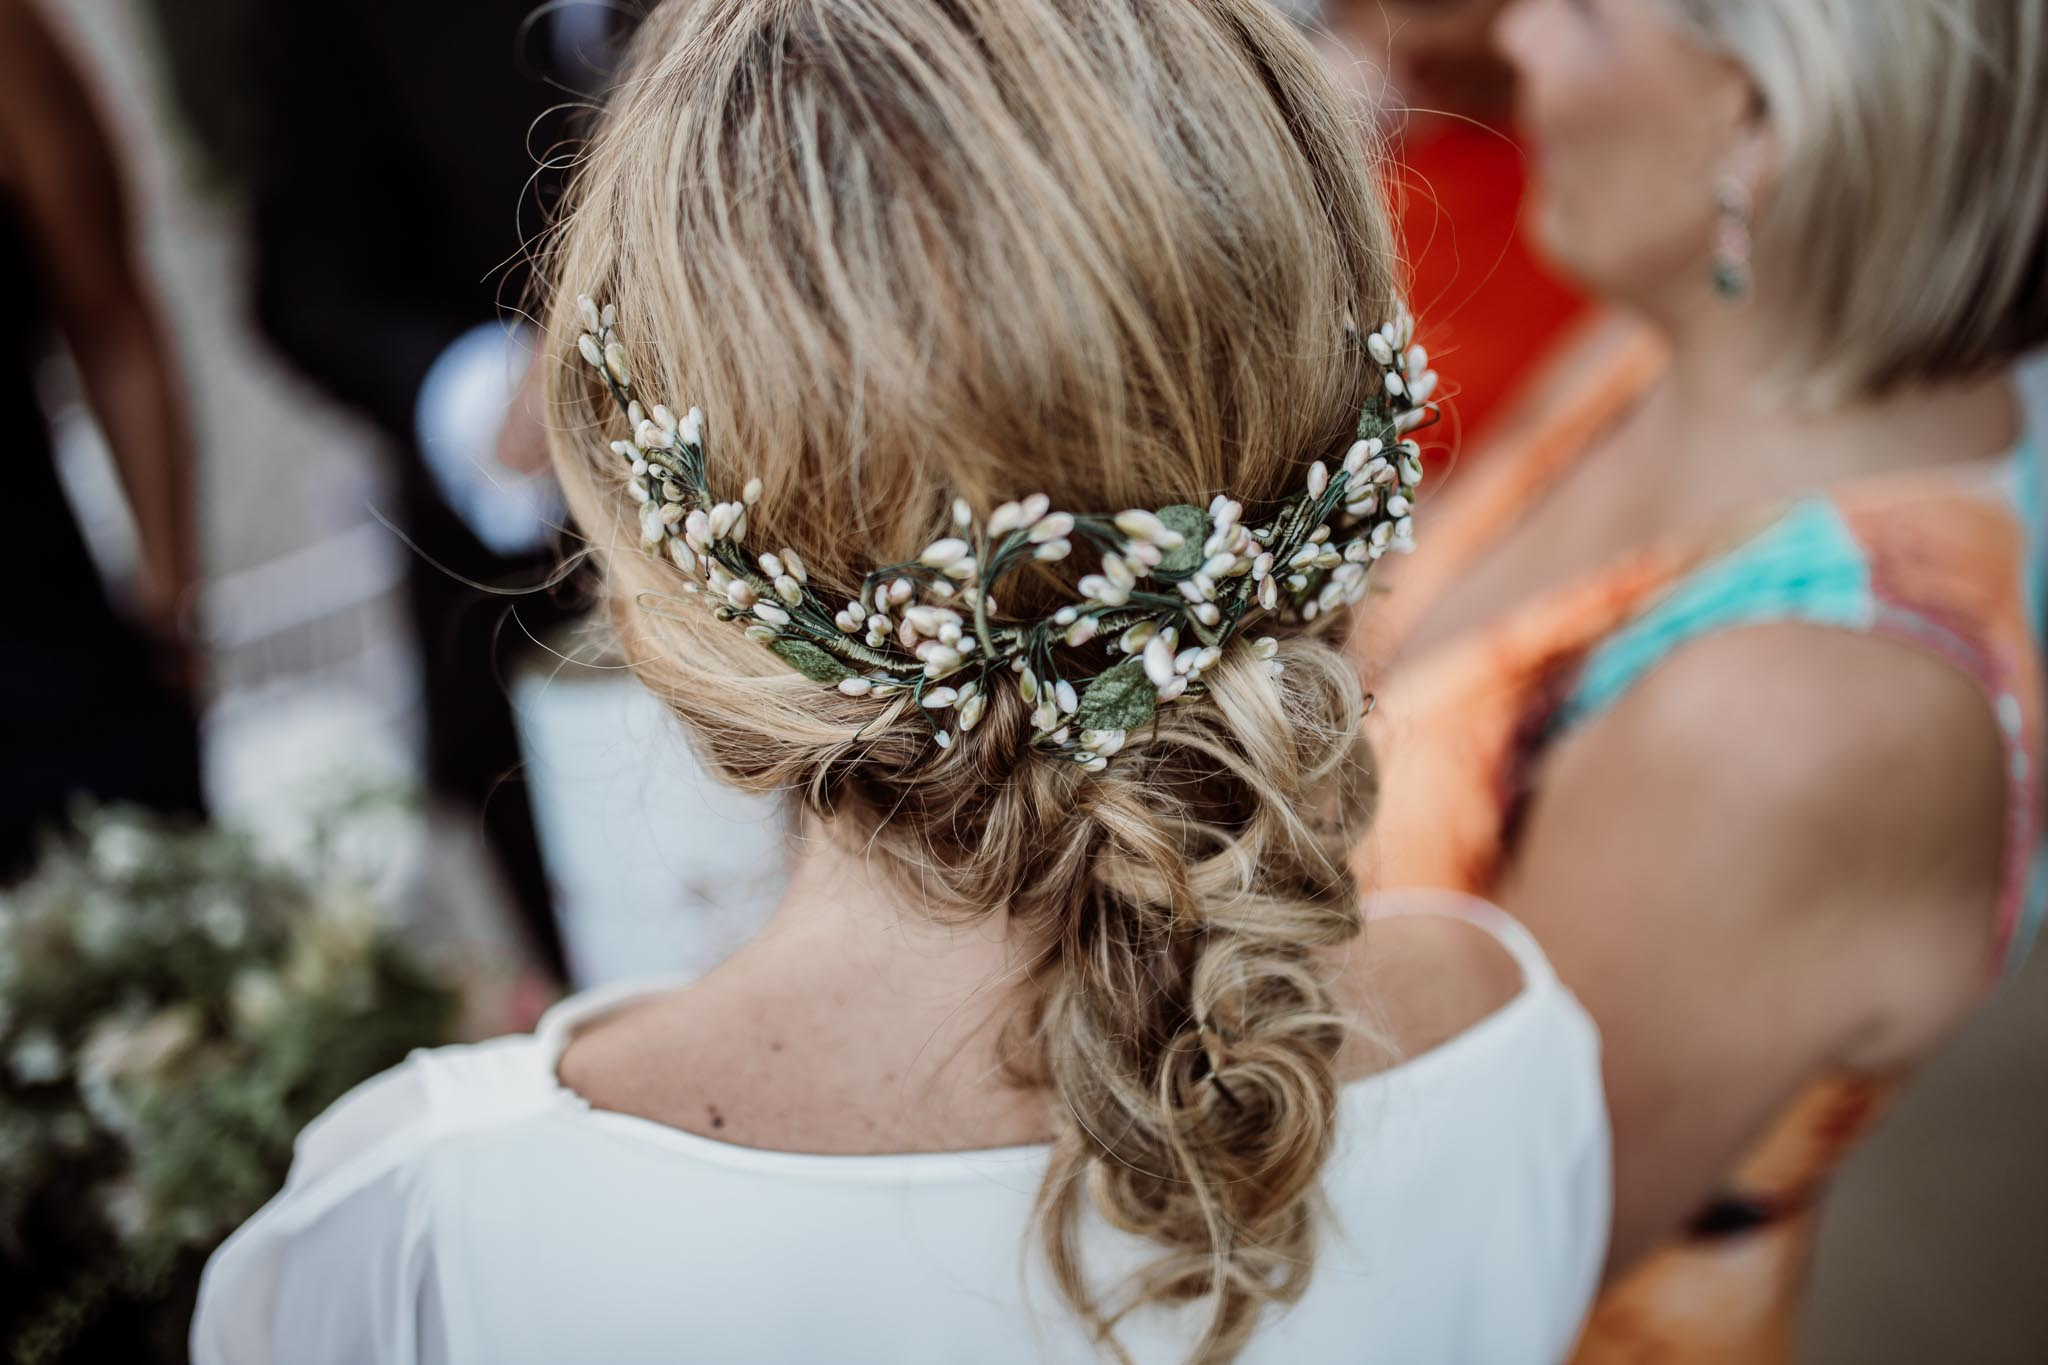 Si-Quiero-Wedding-Planner-By-Sira-Antequera-Bodas-Málaga-Marbella-Miami- Ana-Aitor-23